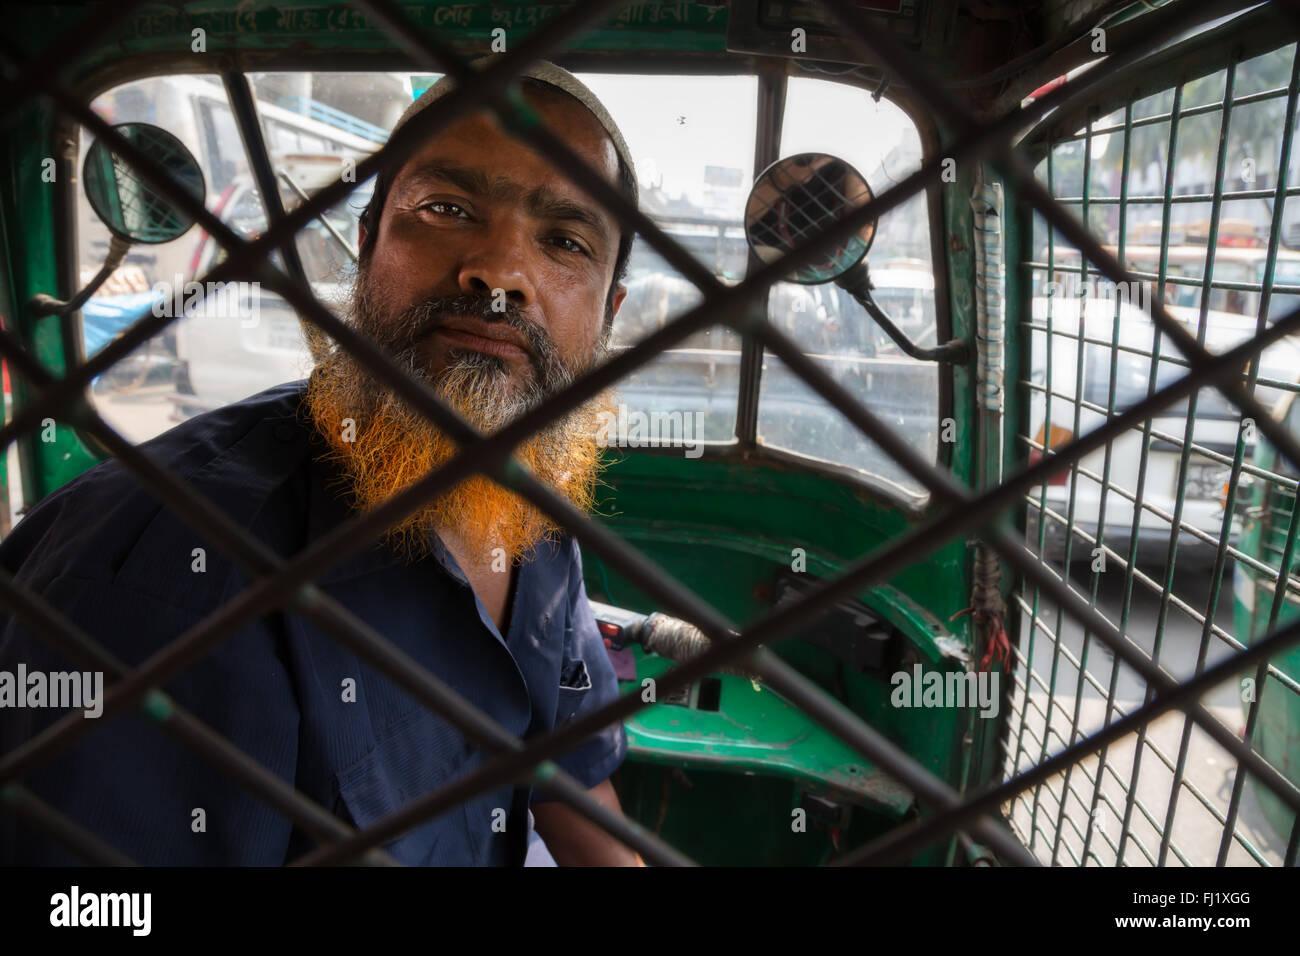 Cab taxi rickshaw driver in Dhaka, Bangladesh - Stock Image